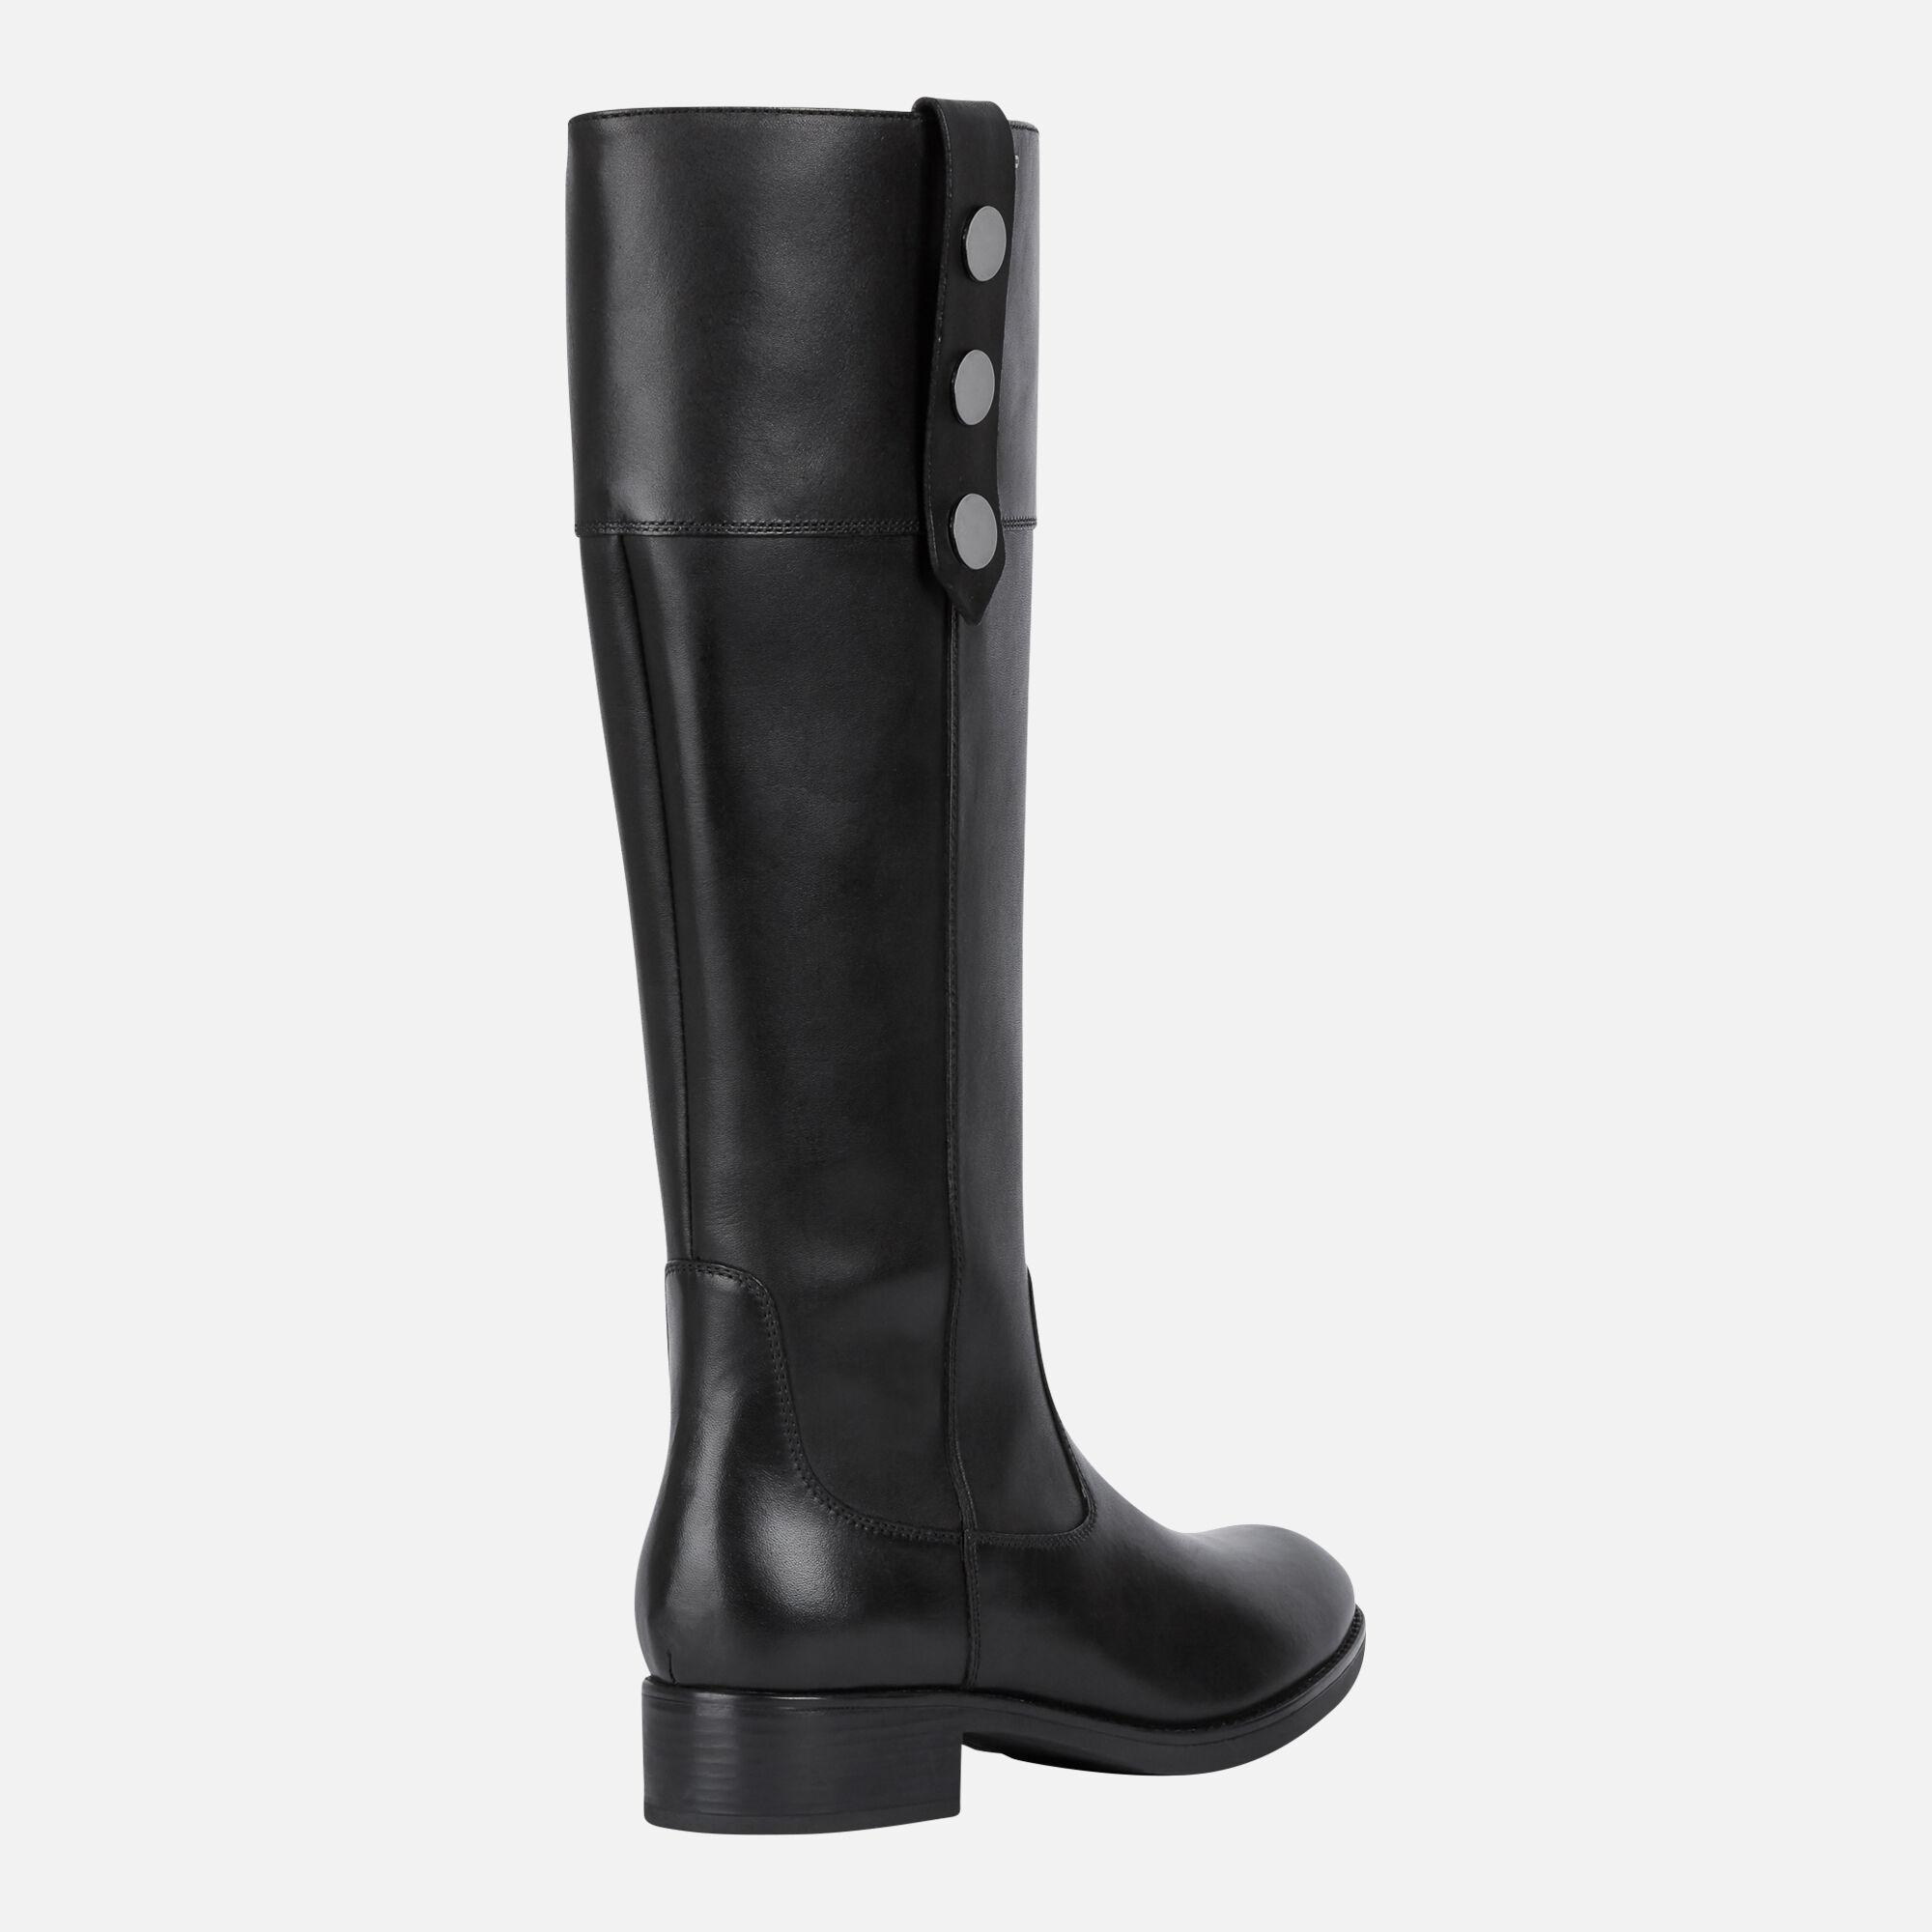 Geox Women's D FELICITY NP ABX Black Boots | Geox Fall Winter